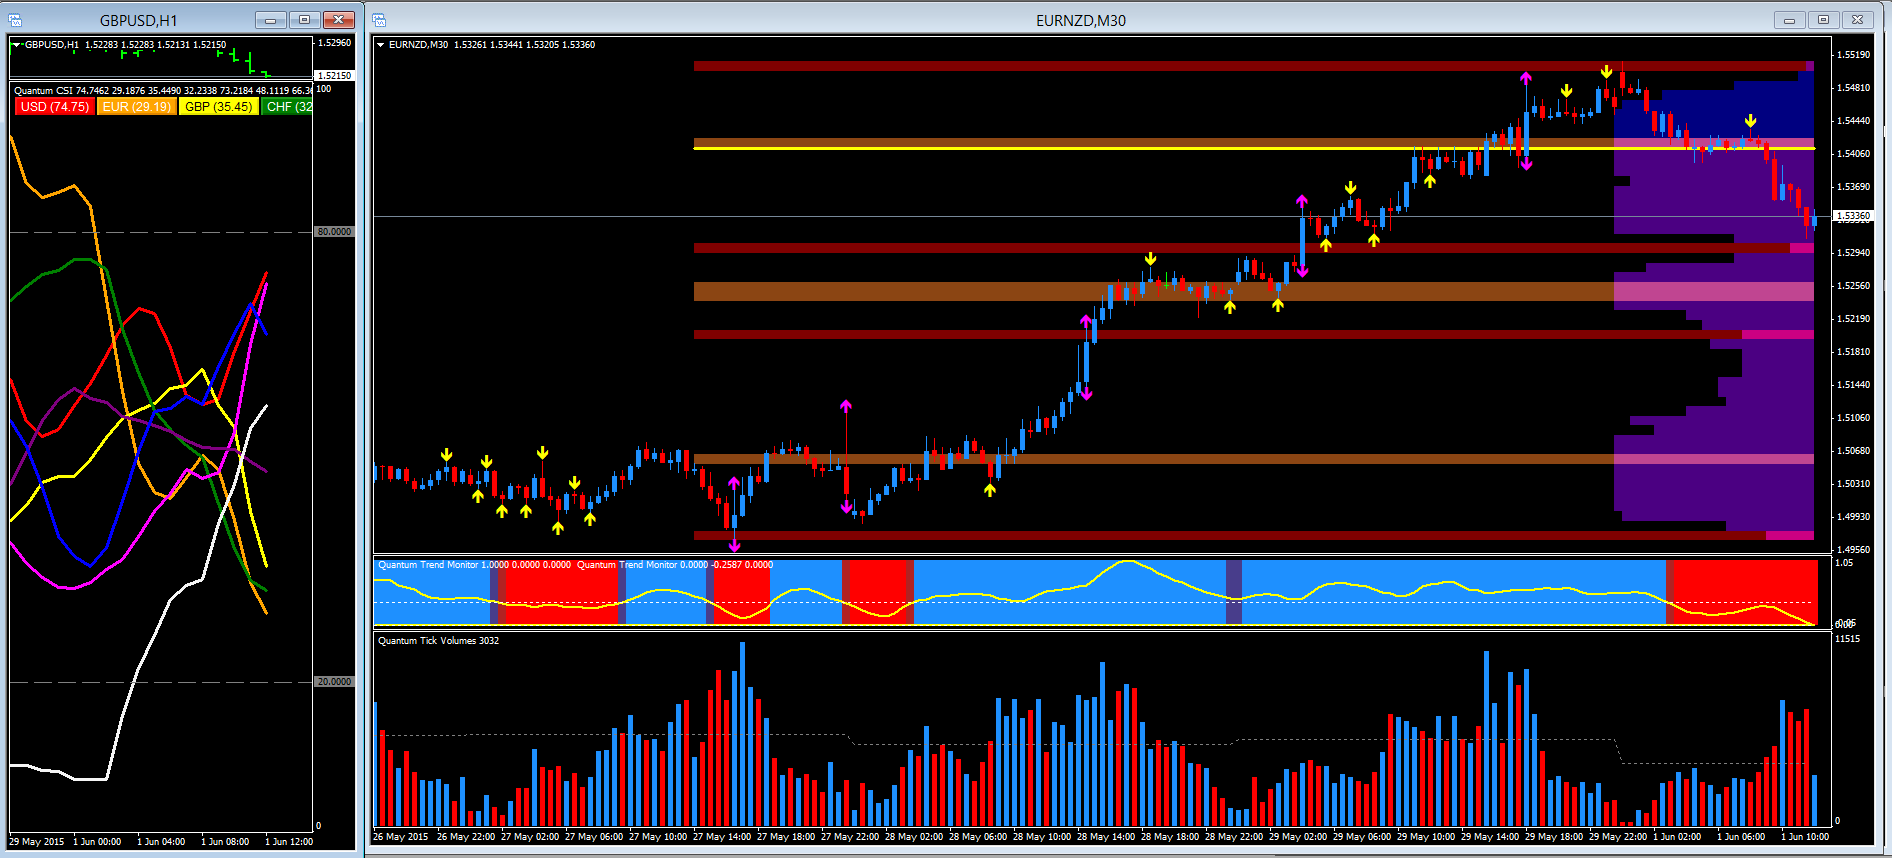 EUR/NZD - 30 minute chart